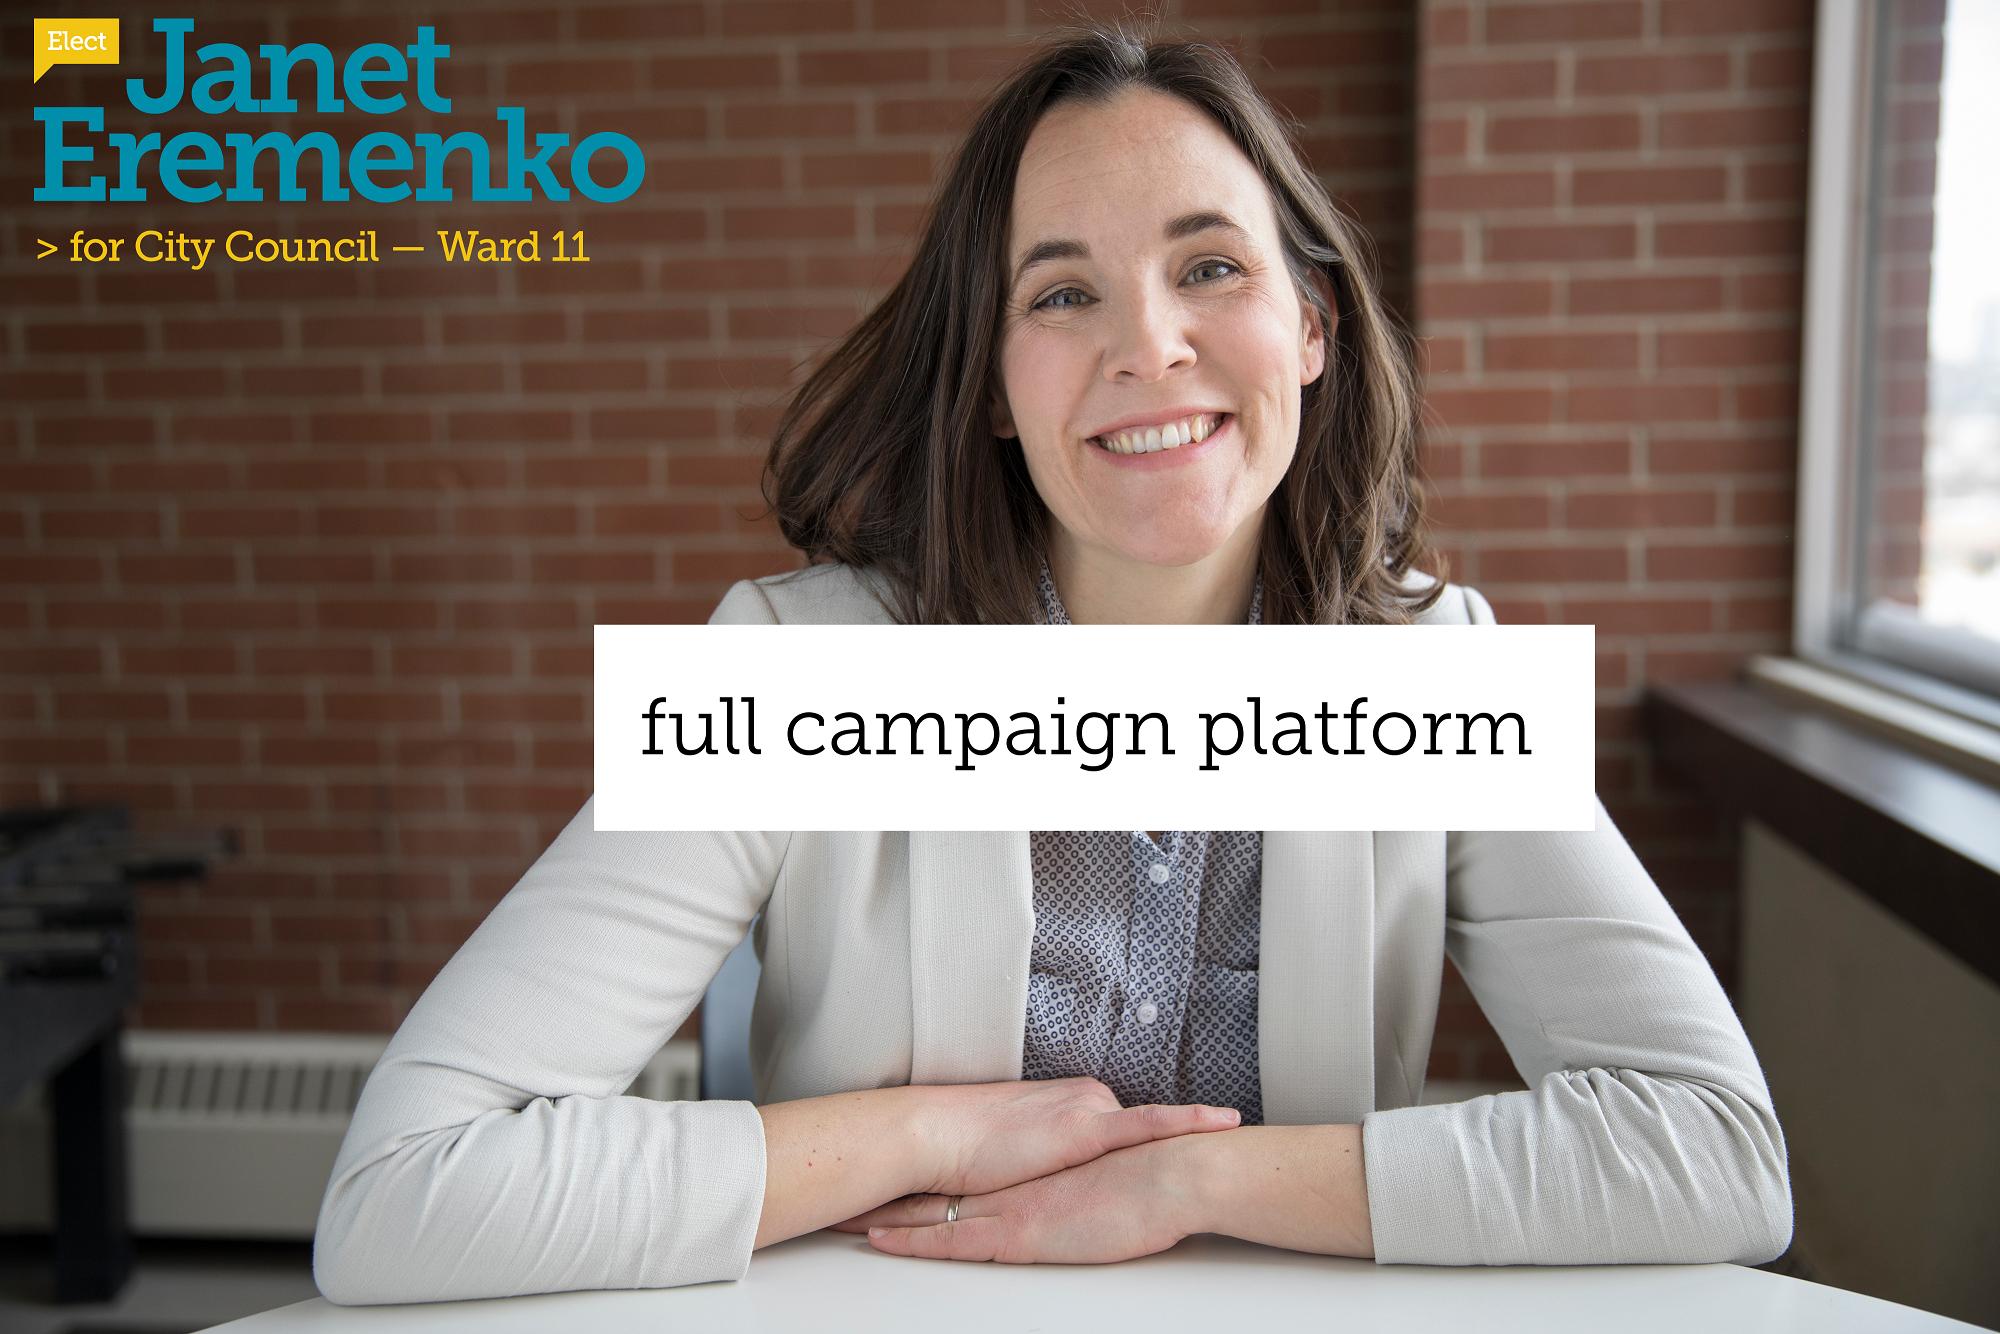 Janet Eremenko full platform